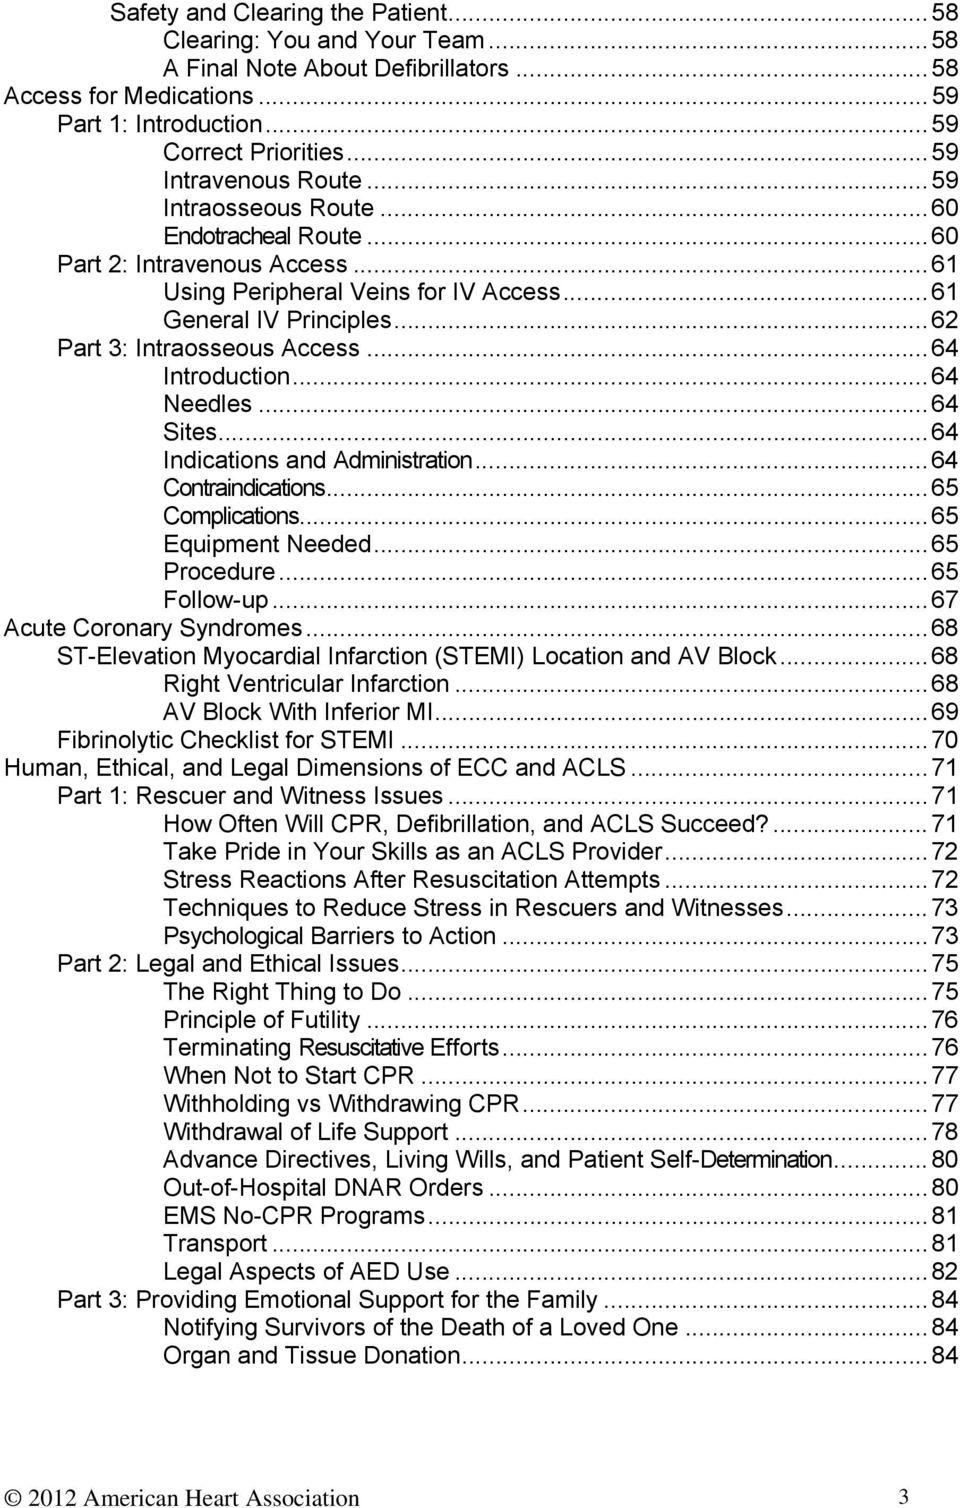 Acls Provider Manual Pdf Free